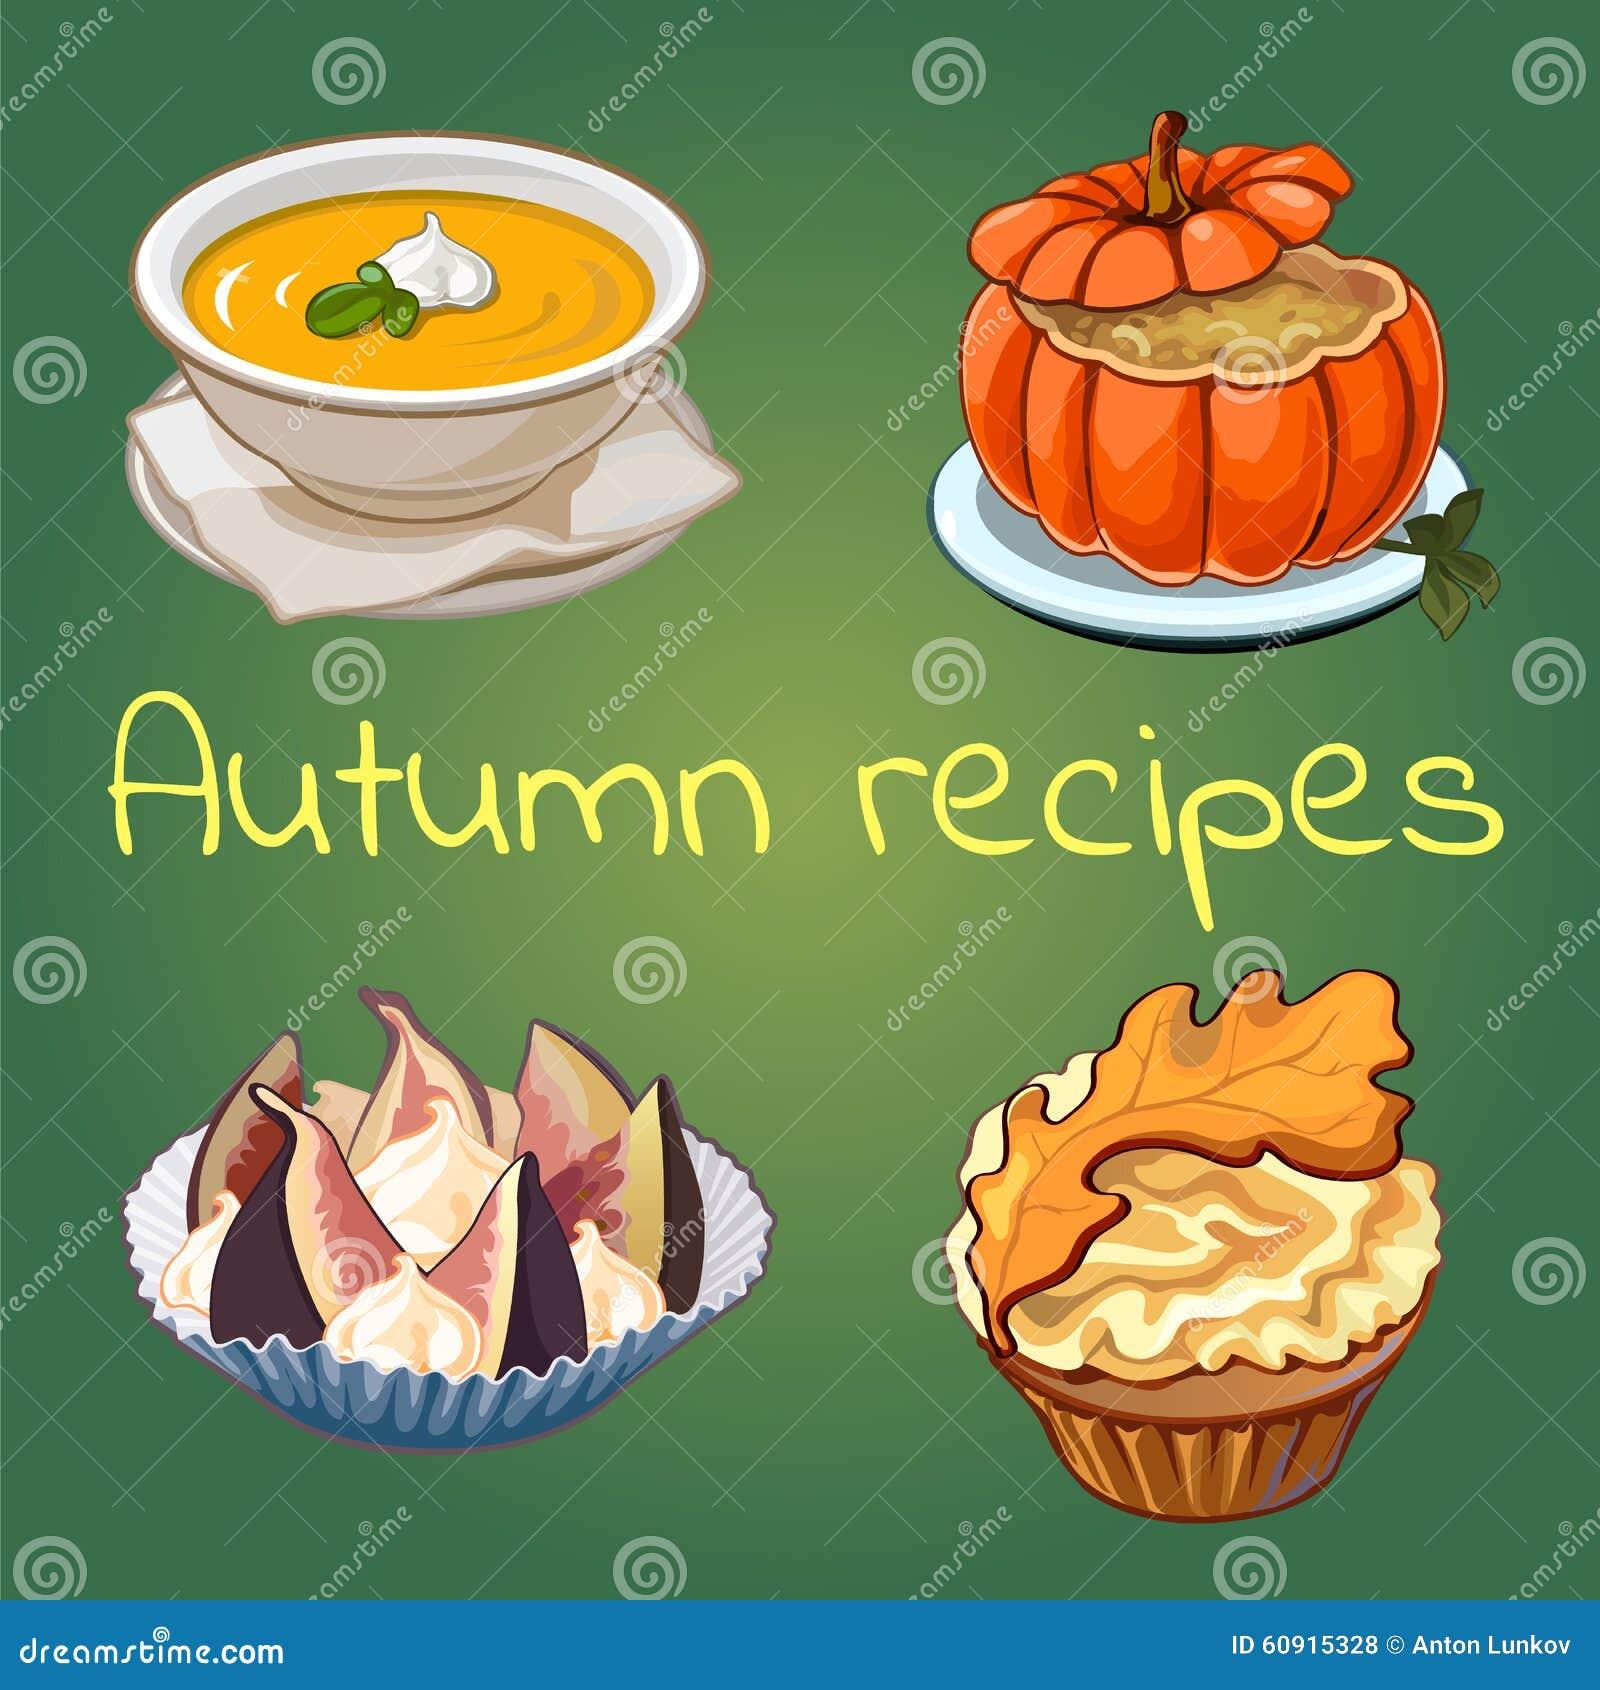 Autumn Recipes Stock Image 59634433